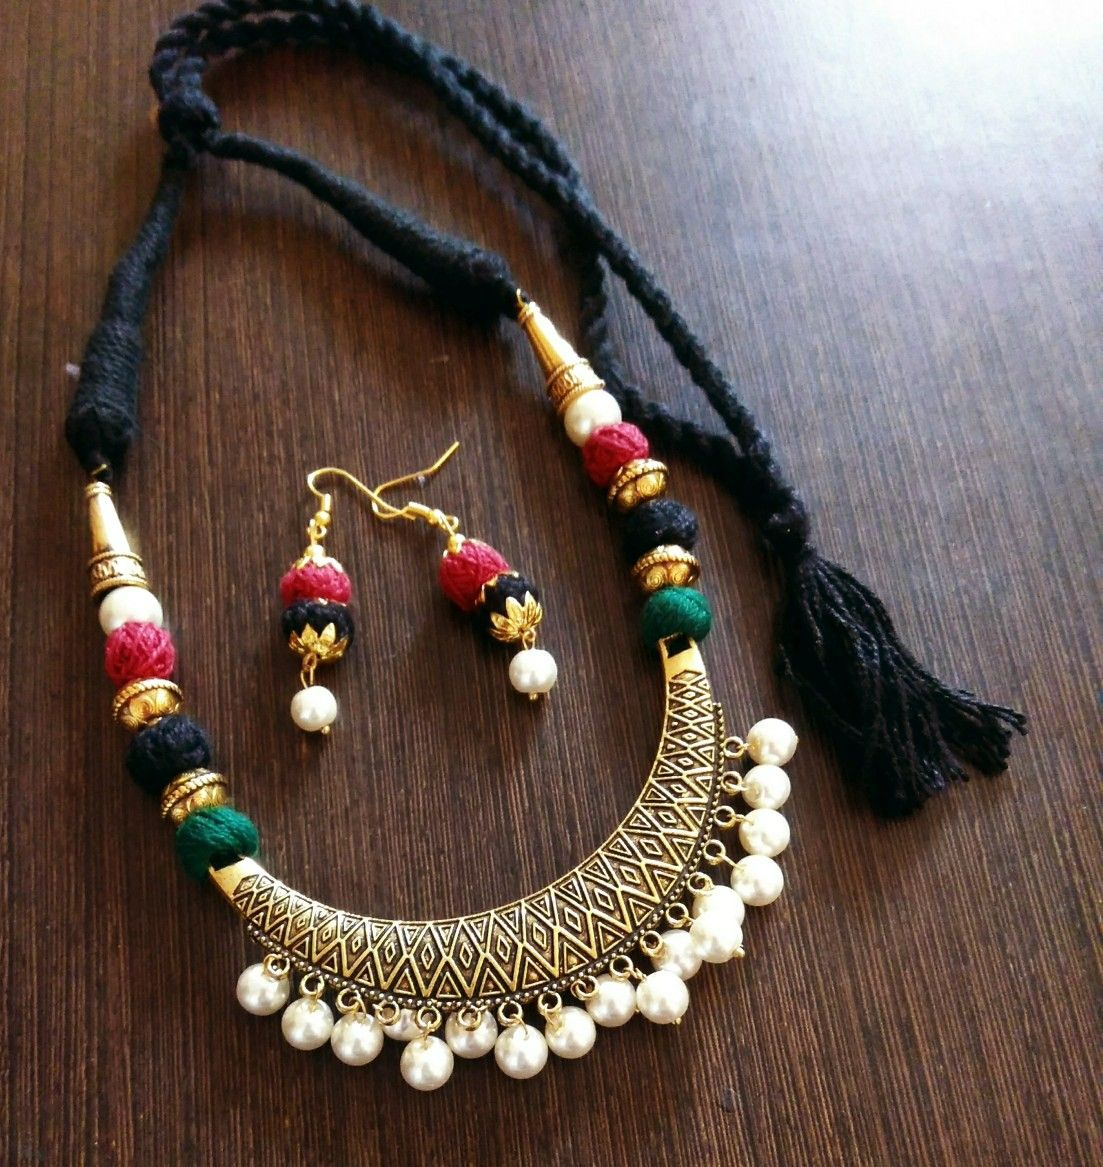 Pin By Suhaila Uckail On Beads Necklace Bead Jewellery Jewelry Patterns Fashion Jewelry